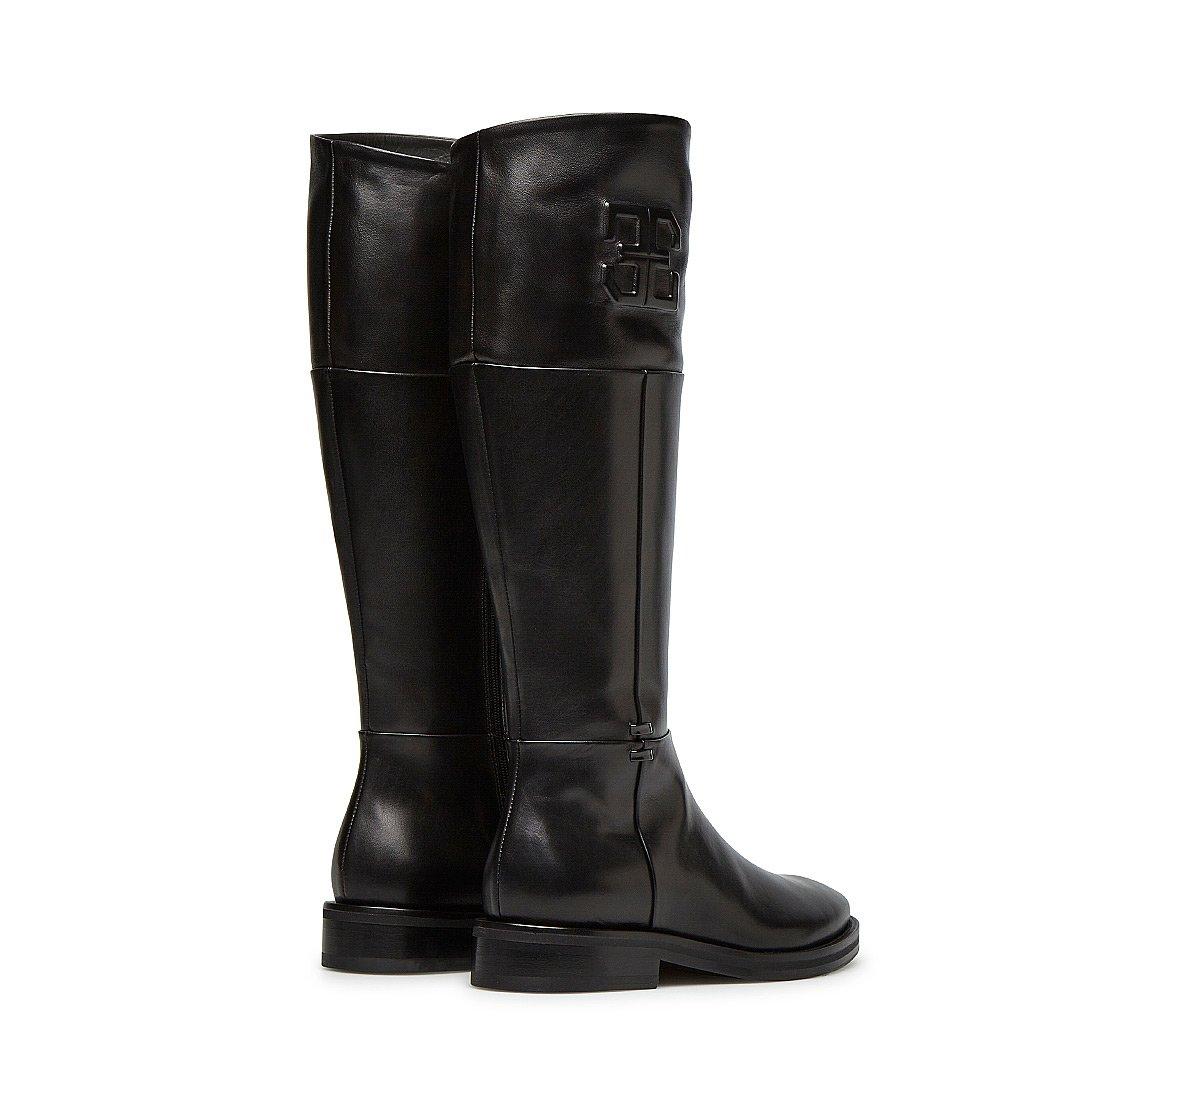 Fabi Icon high boots